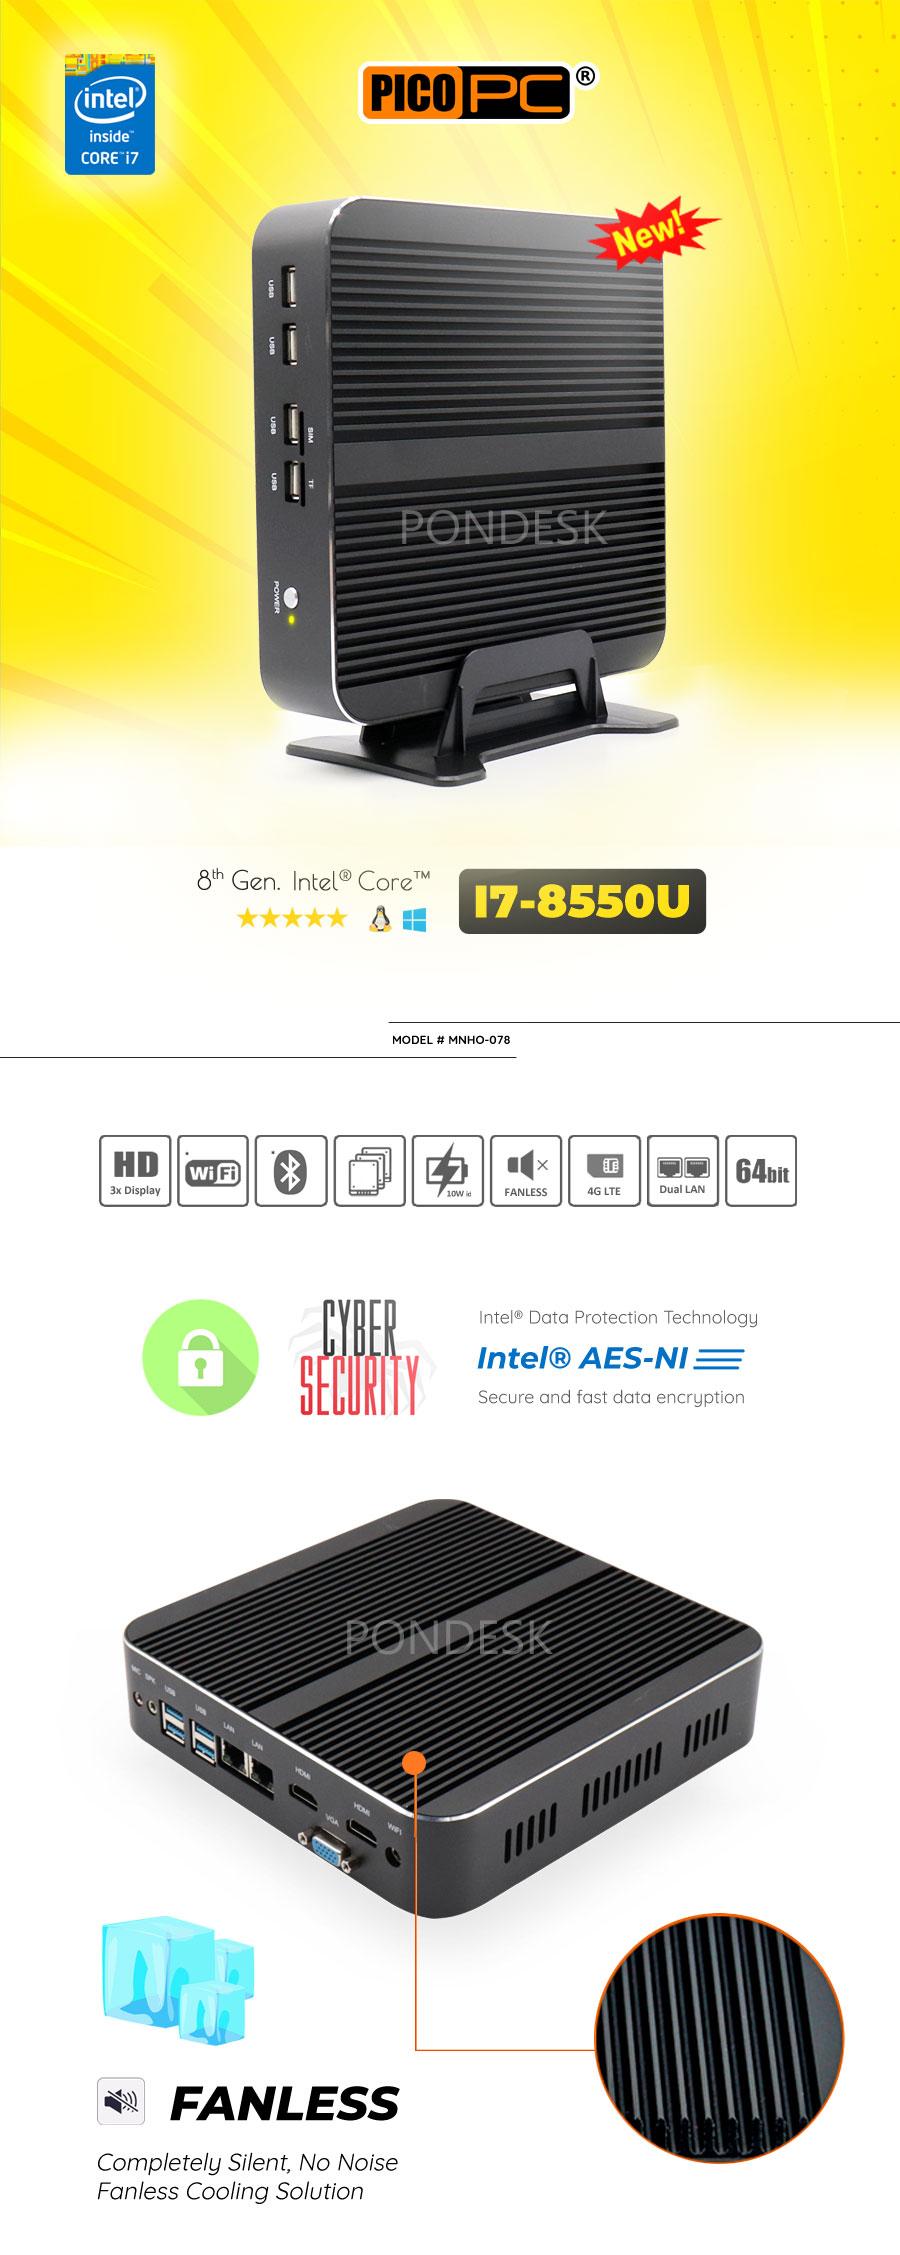 8th Gen Intel® Core i7-8550U 2 LAN 3 Display Fanless Mini PC - MNHO-078 | Image